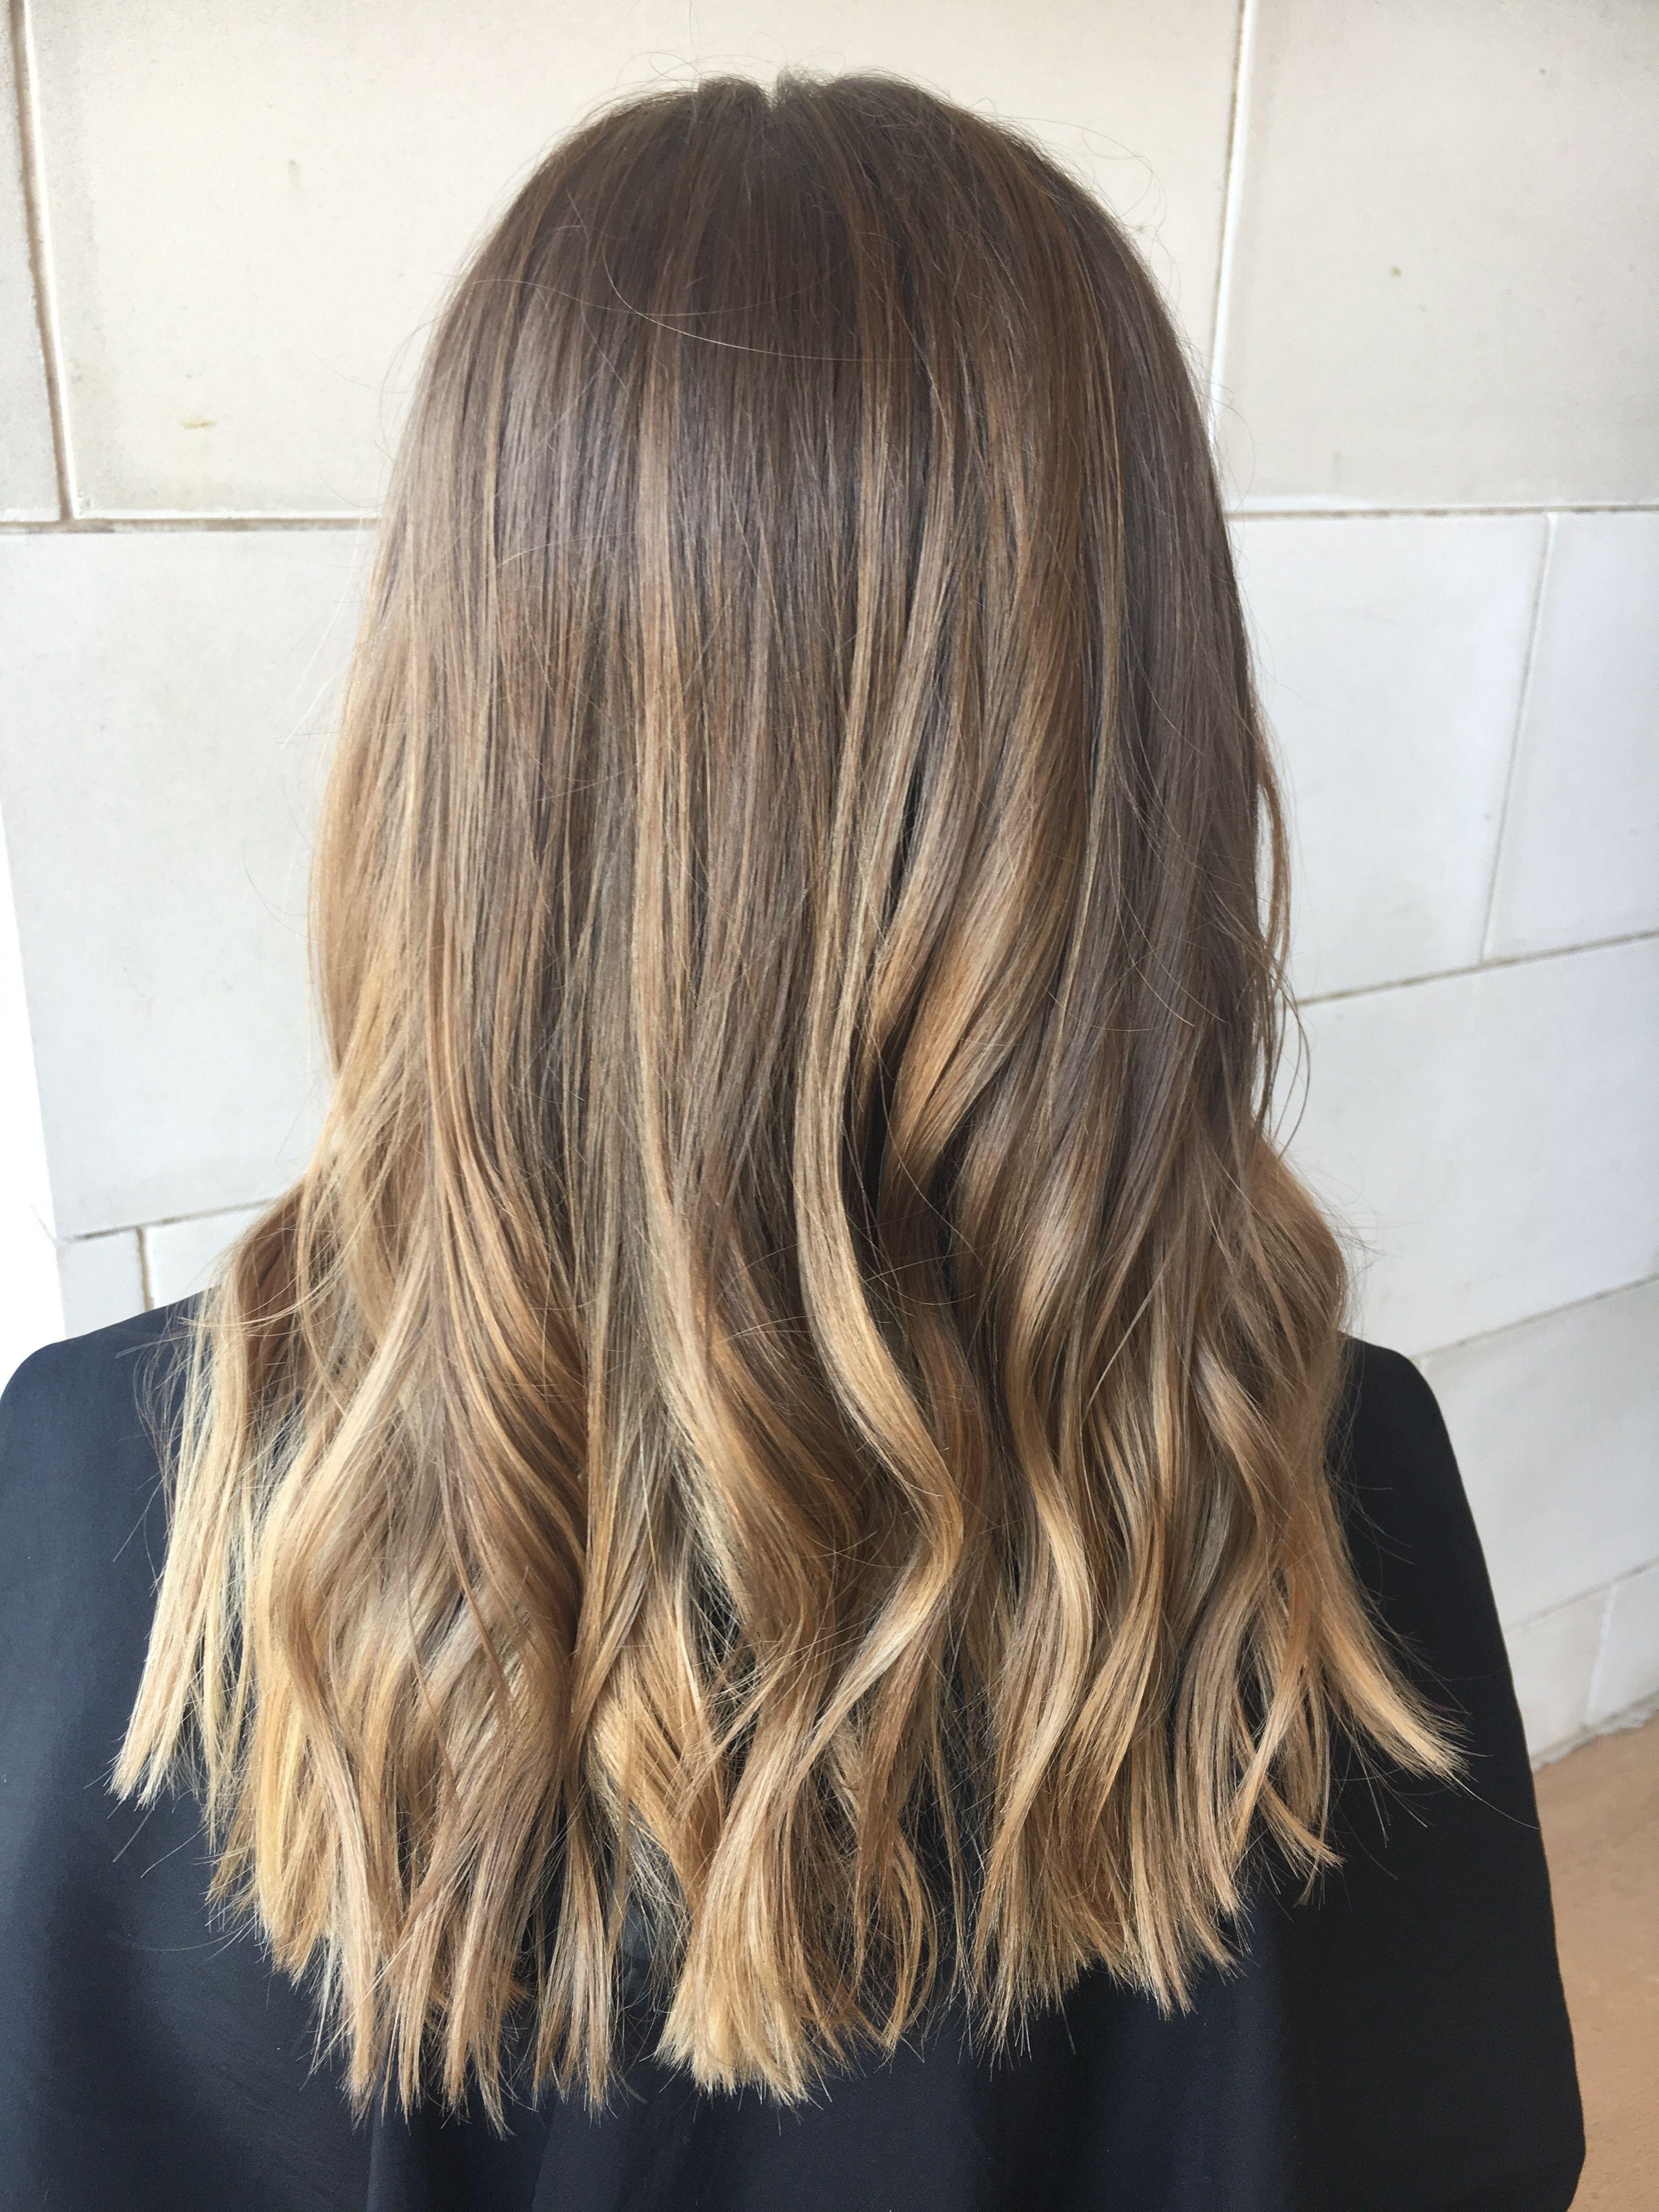 Balayage Light Brown And Blonde Medium Length Hair Ombrehairdiy Medium Length Hair Styles Brown Hair Balayage Ombre Hair Blonde